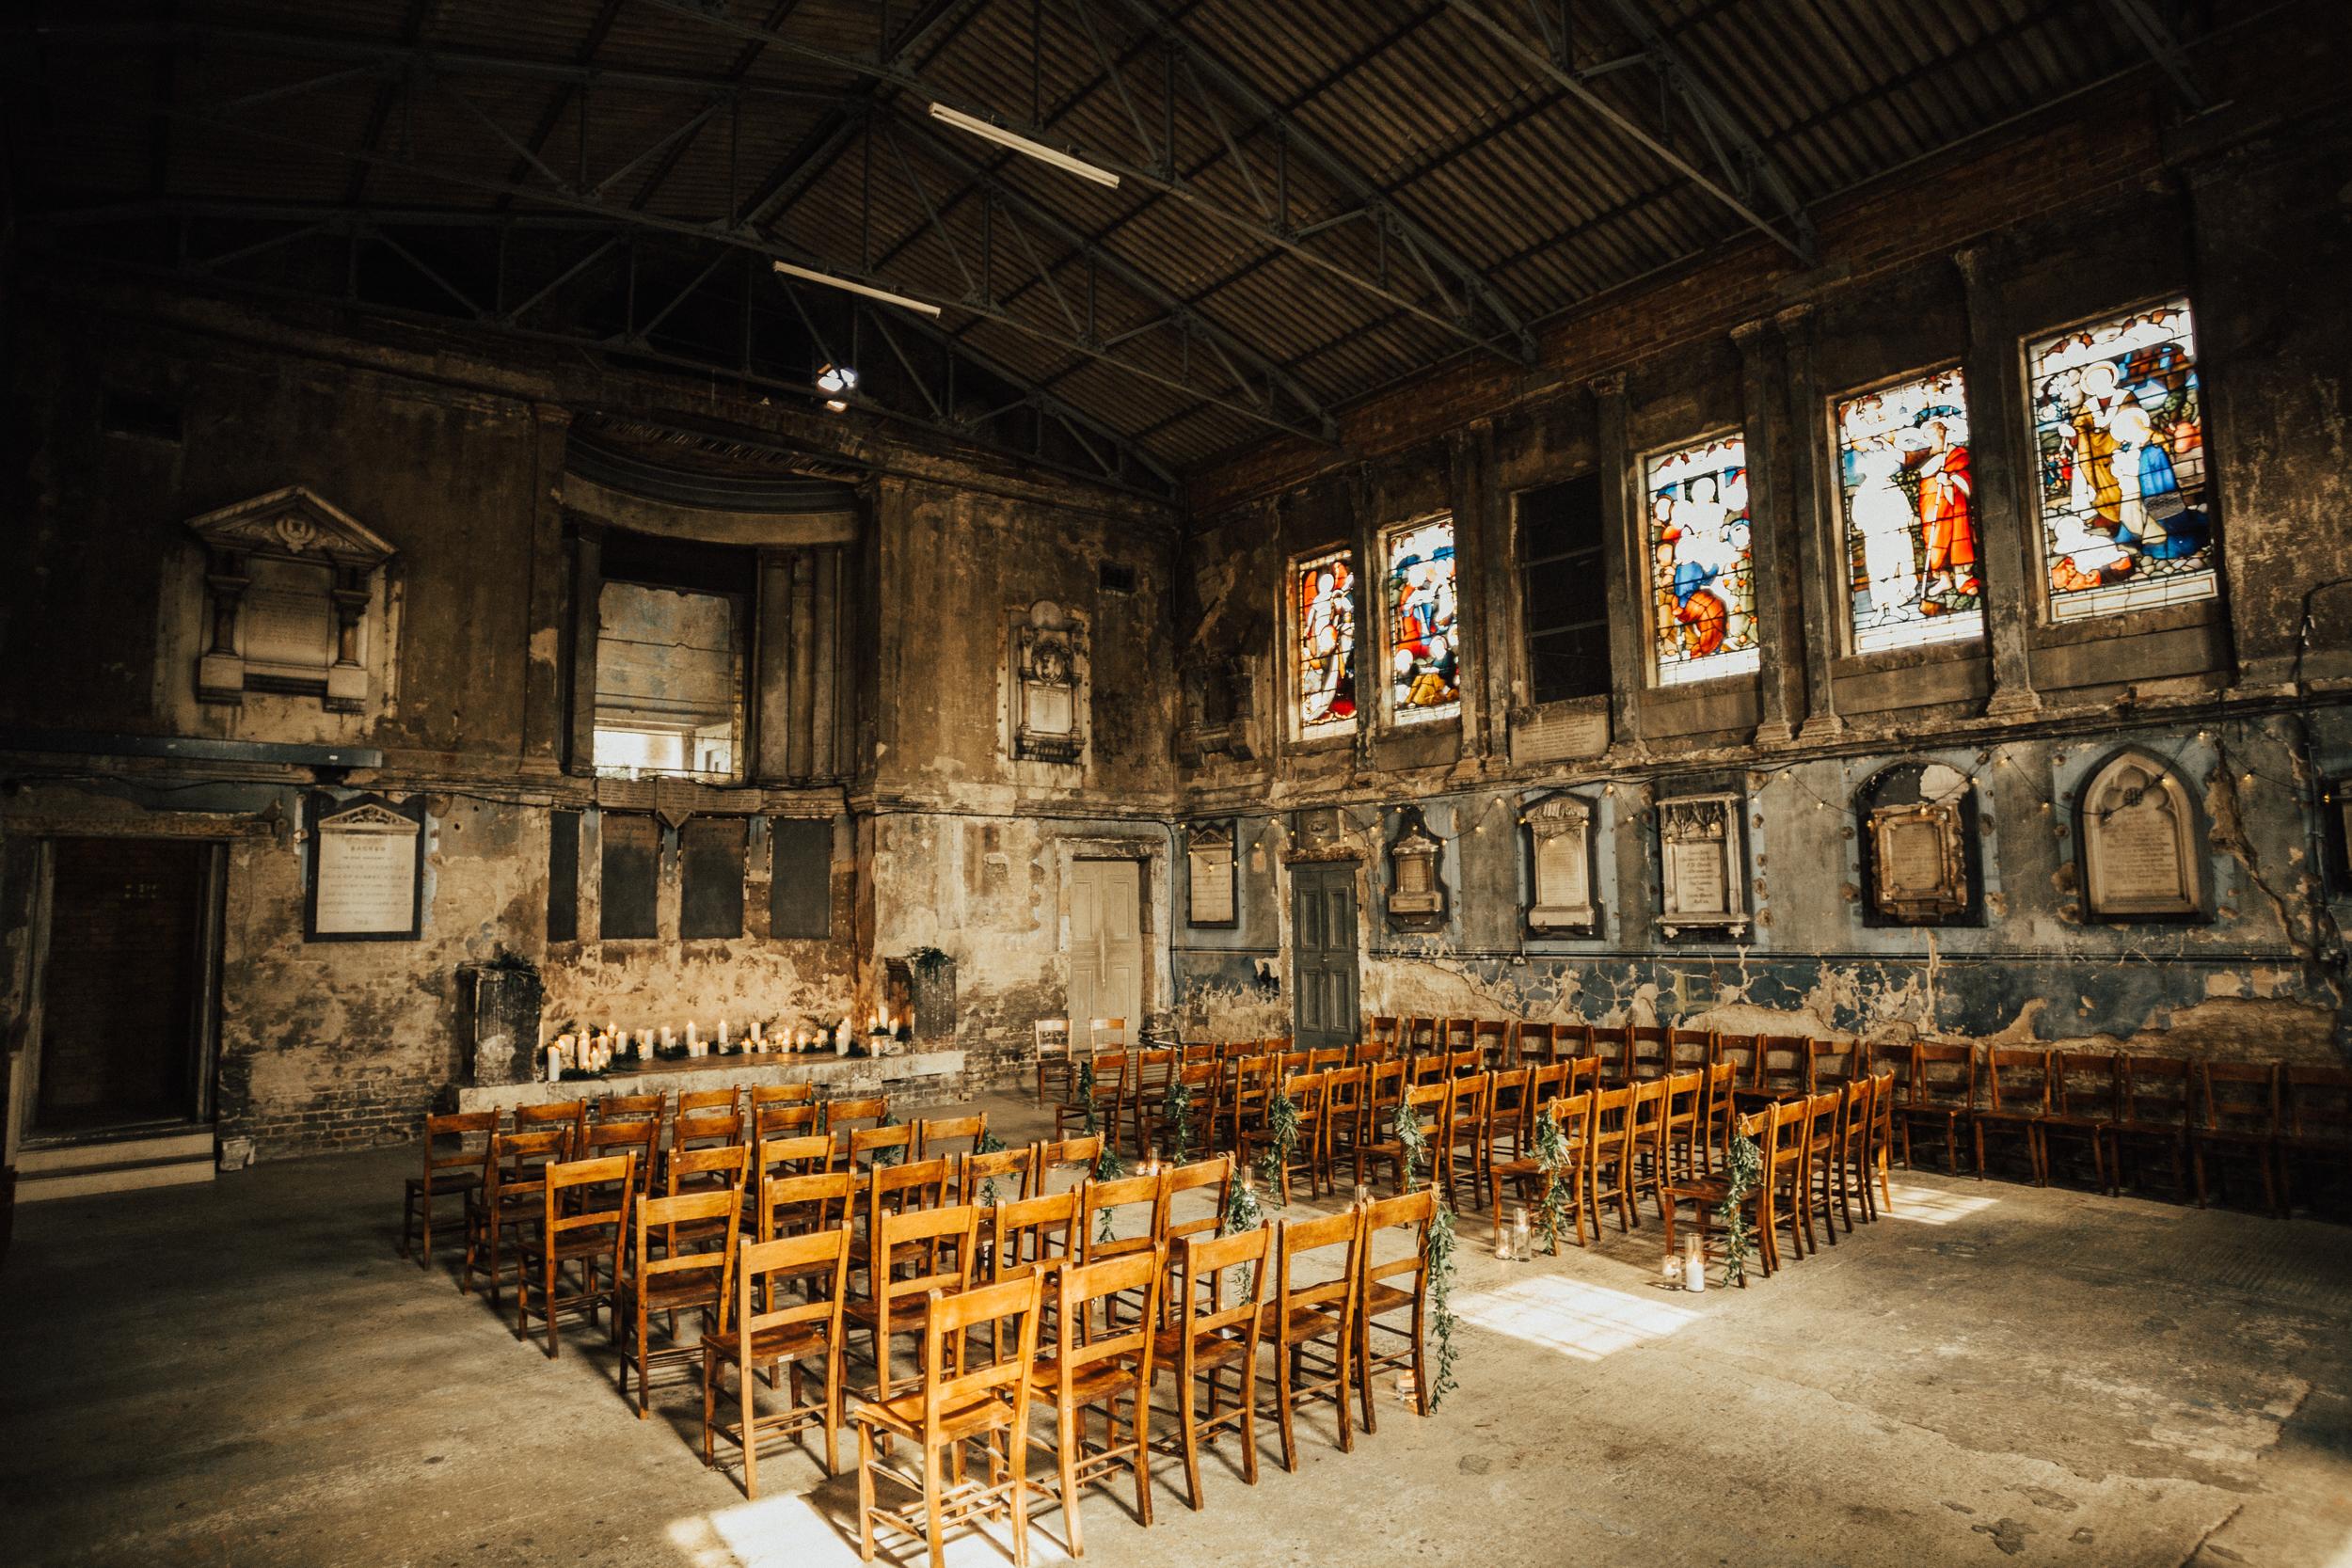 Laura-Benn-The-Asylum-London-The-Ace-Hotel-Wedding-Alternative-Darina-Stoda-Photography-301.jpg